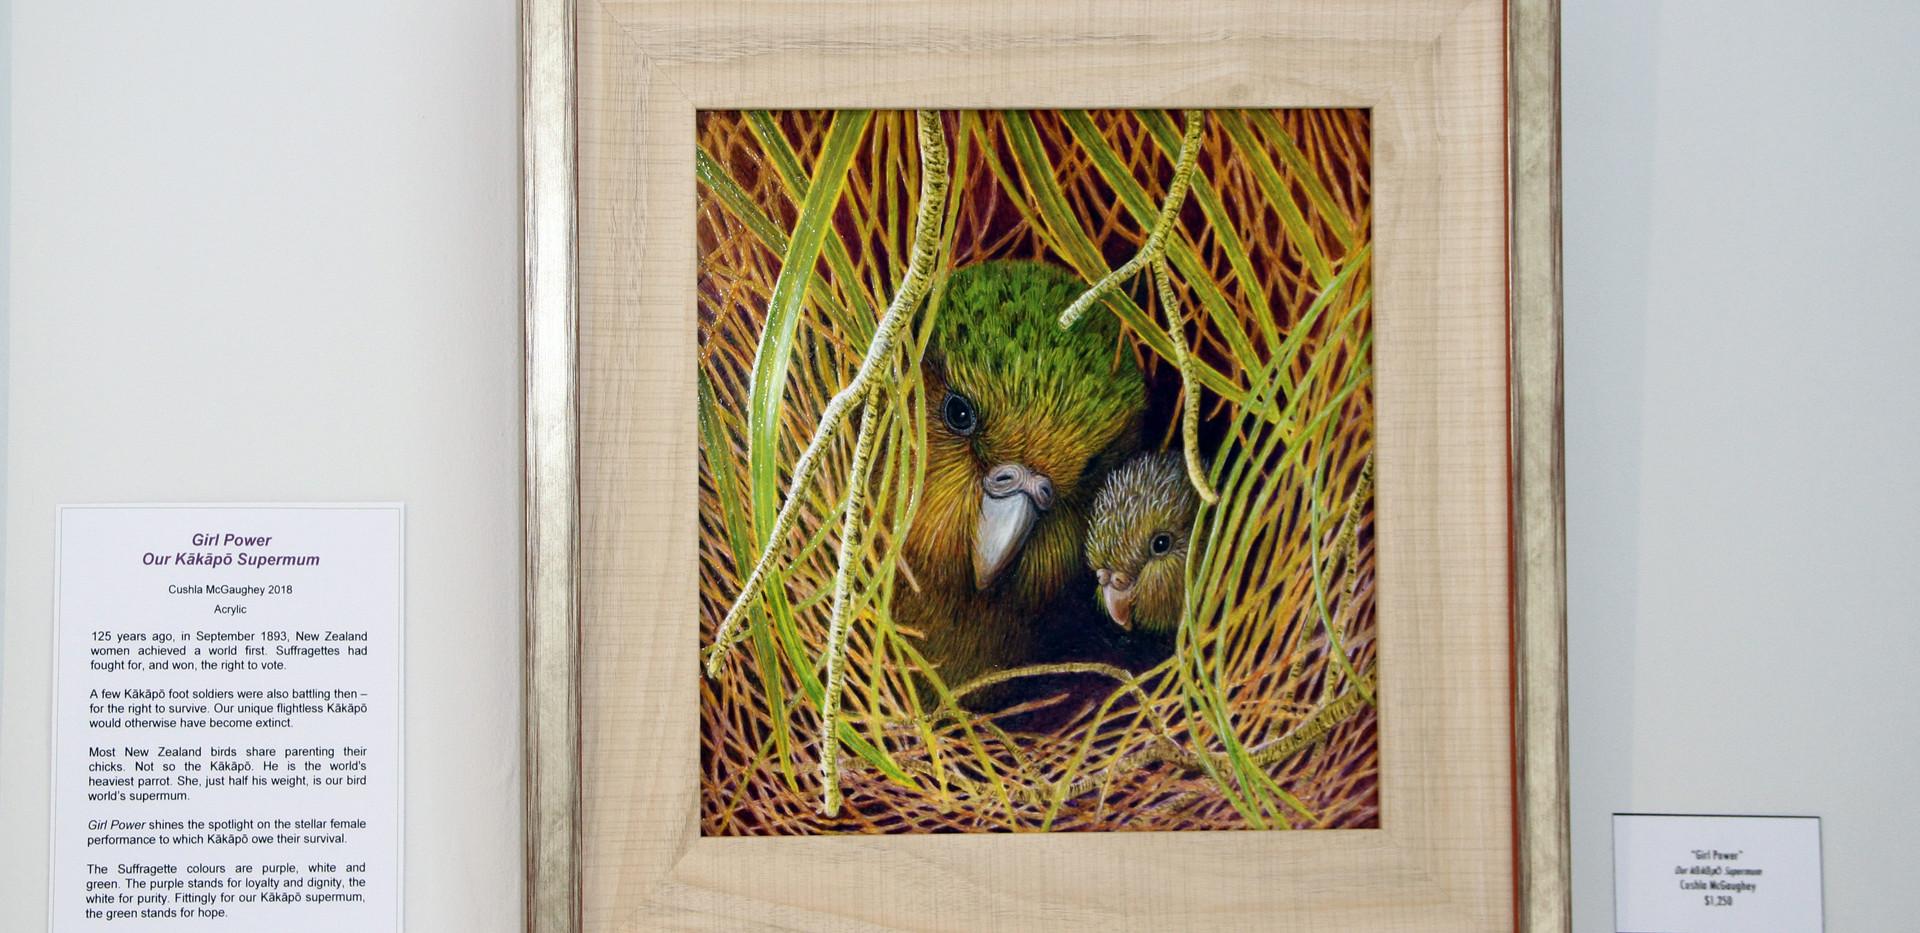 'Girl Power - Our Kakapo Supermum' Cushla McGaughey